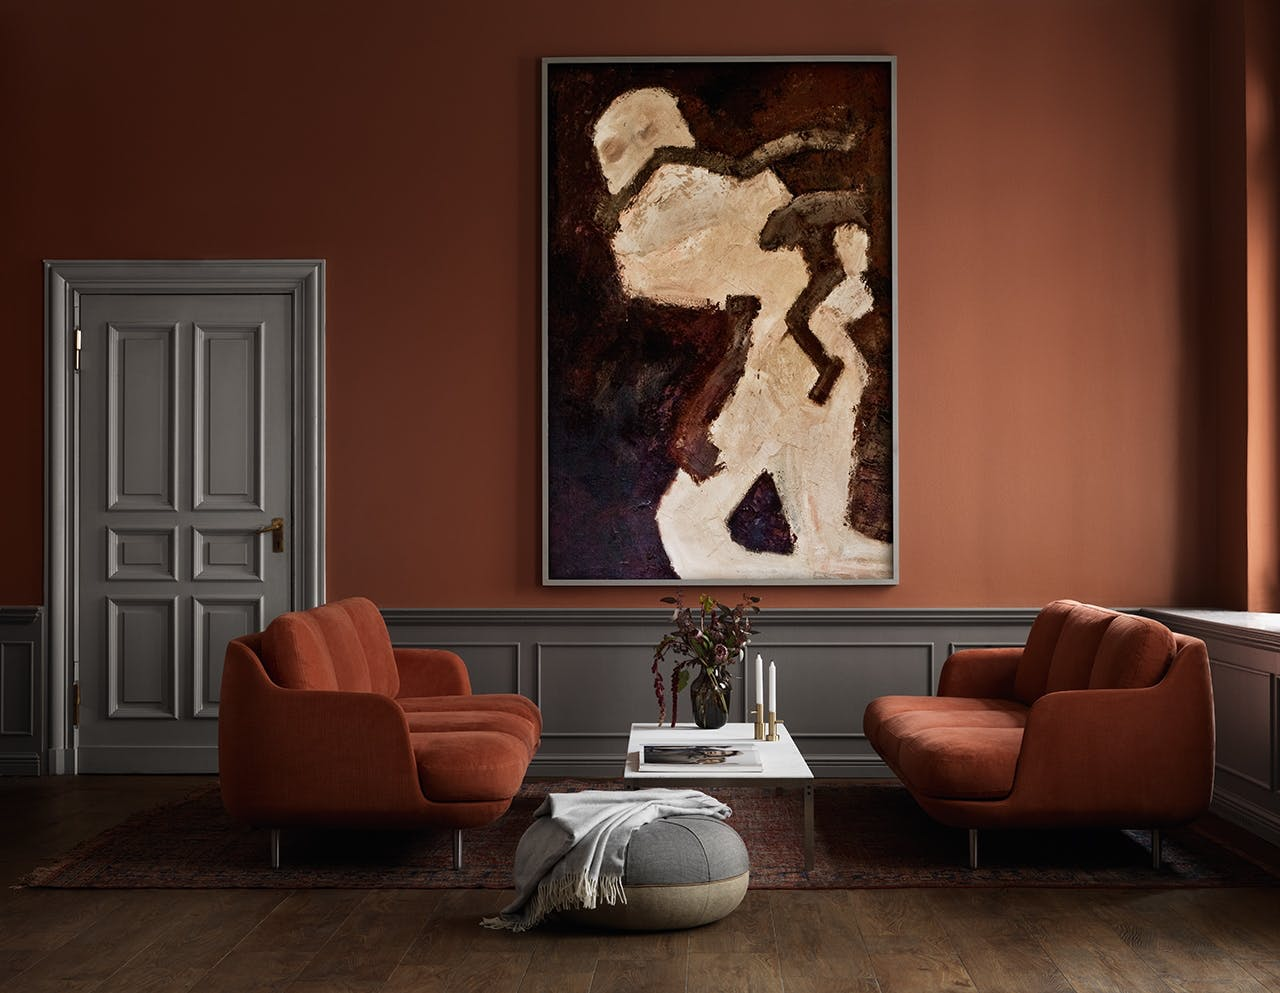 fritzhansen.com sofa i okker farve